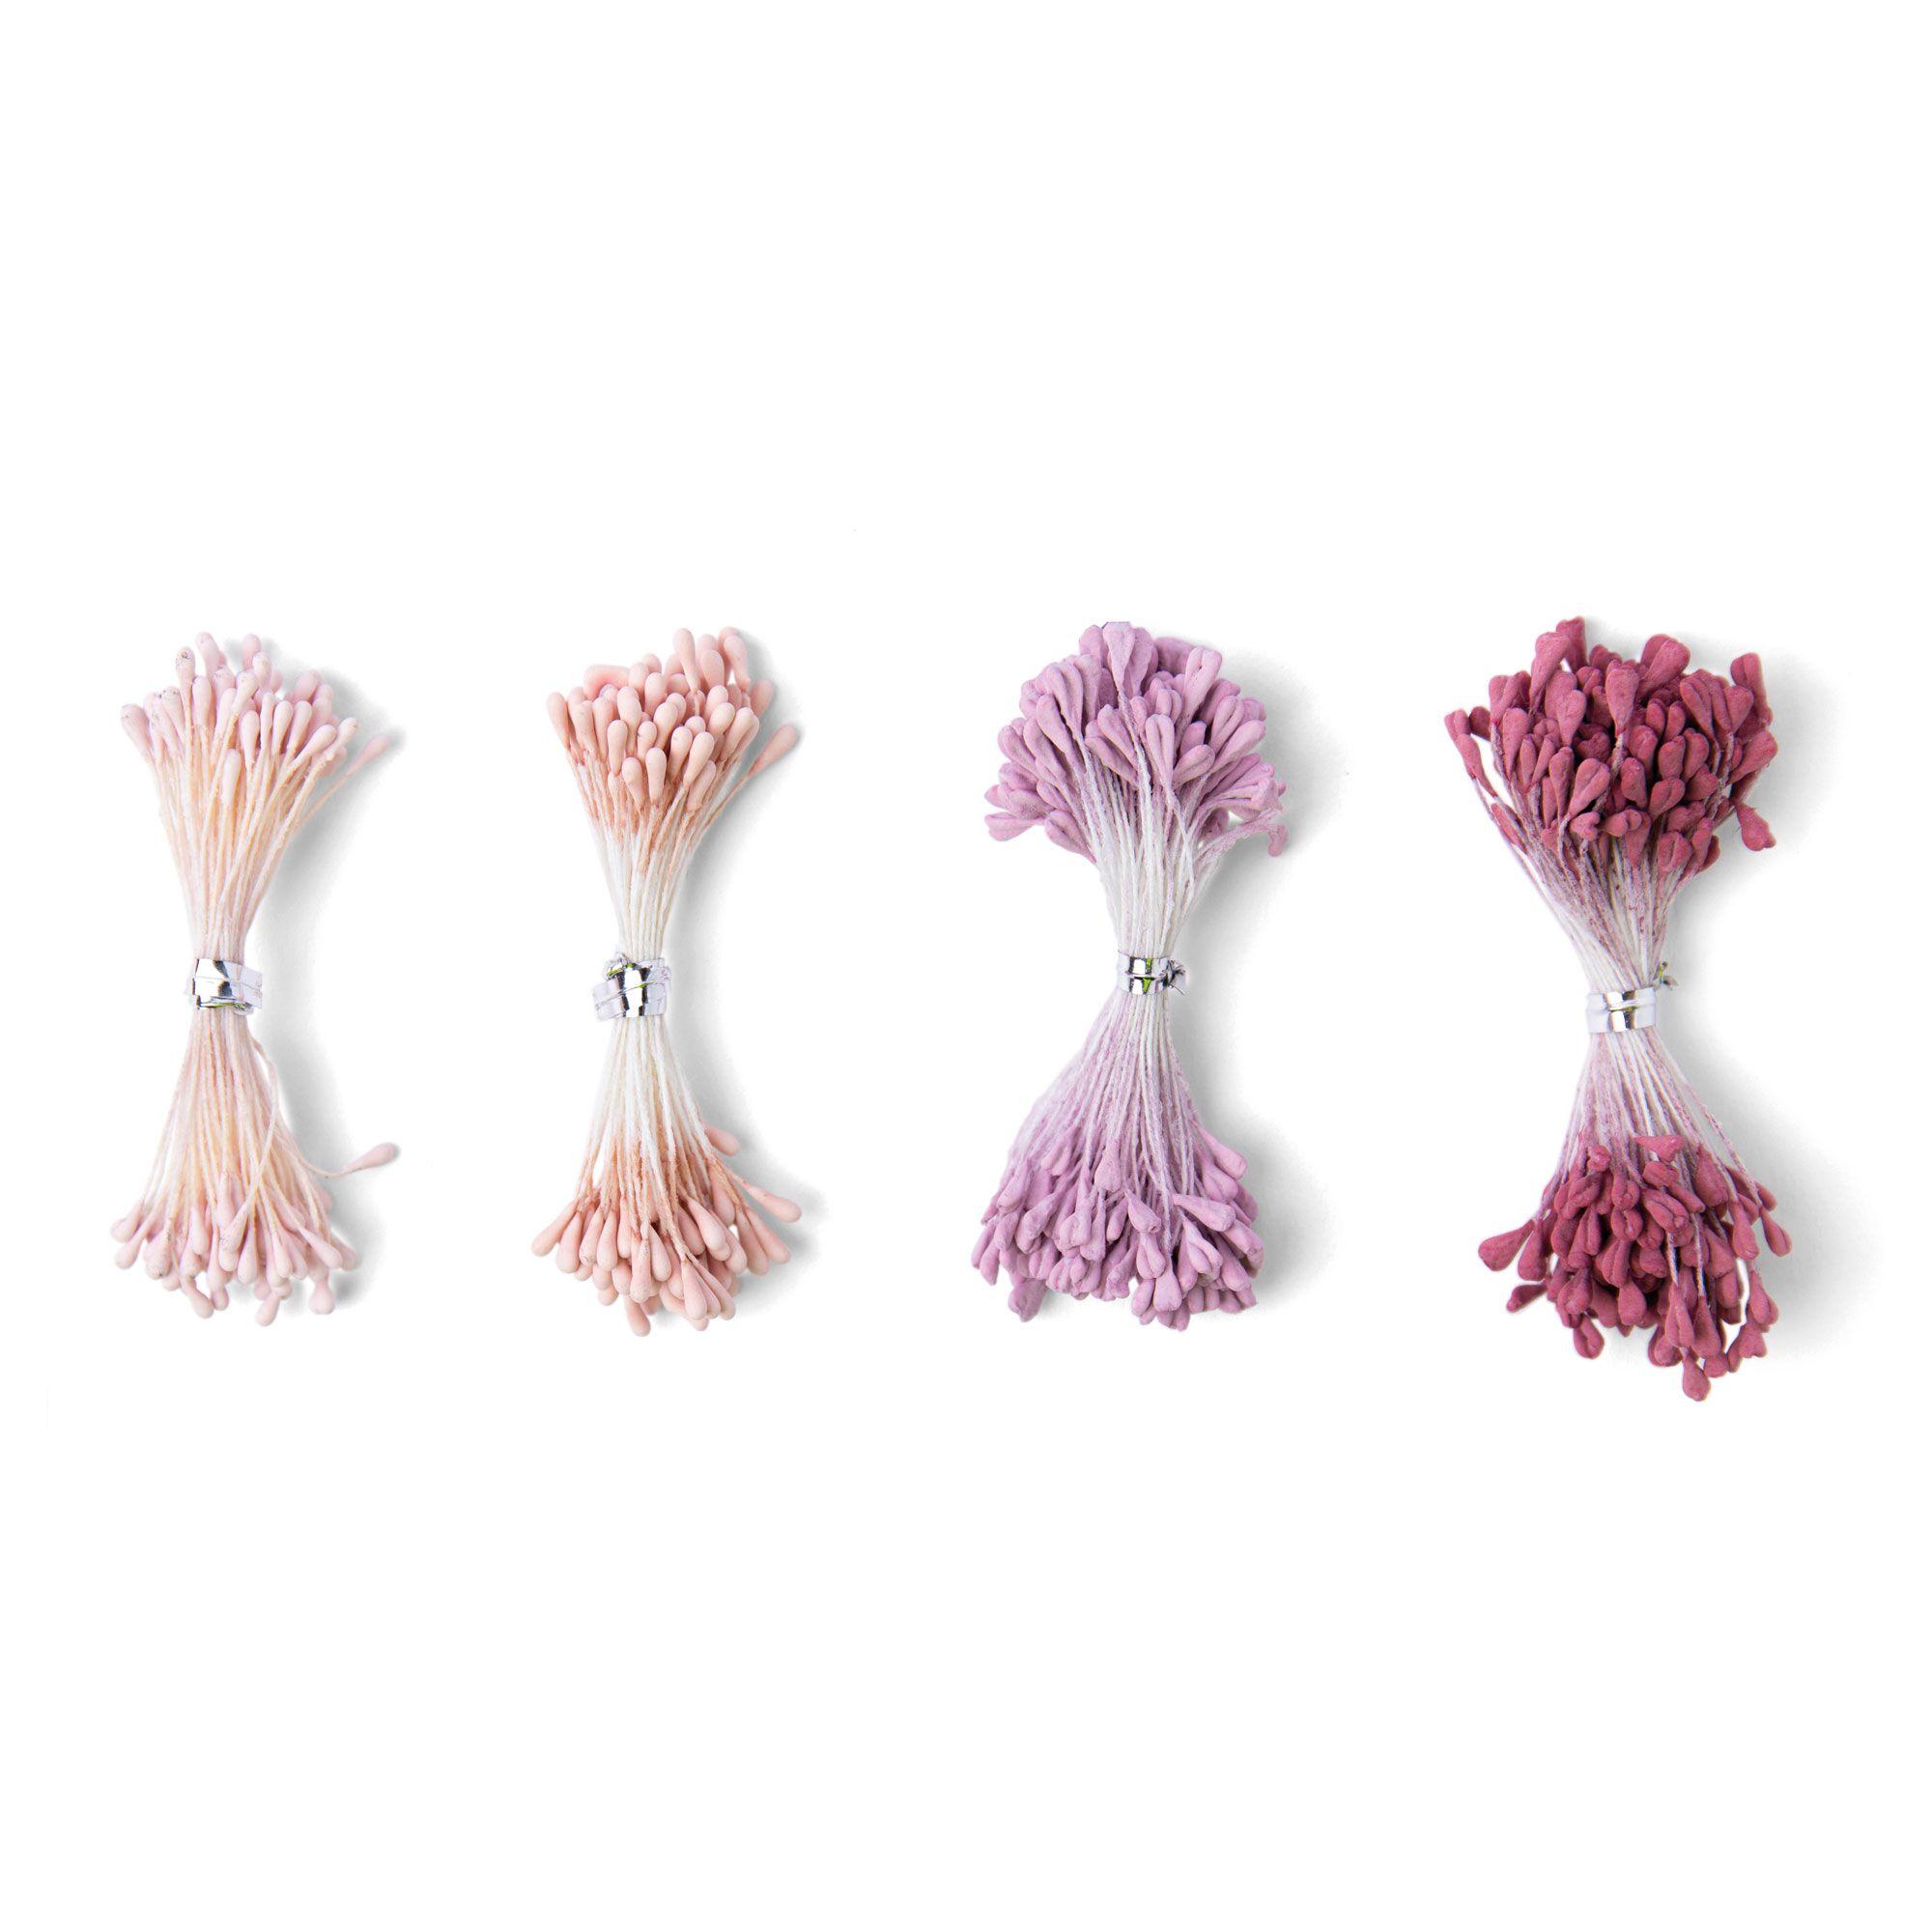 Sizzix Making Essential - Flower Stamens, Pink/Purple, Assorted ...